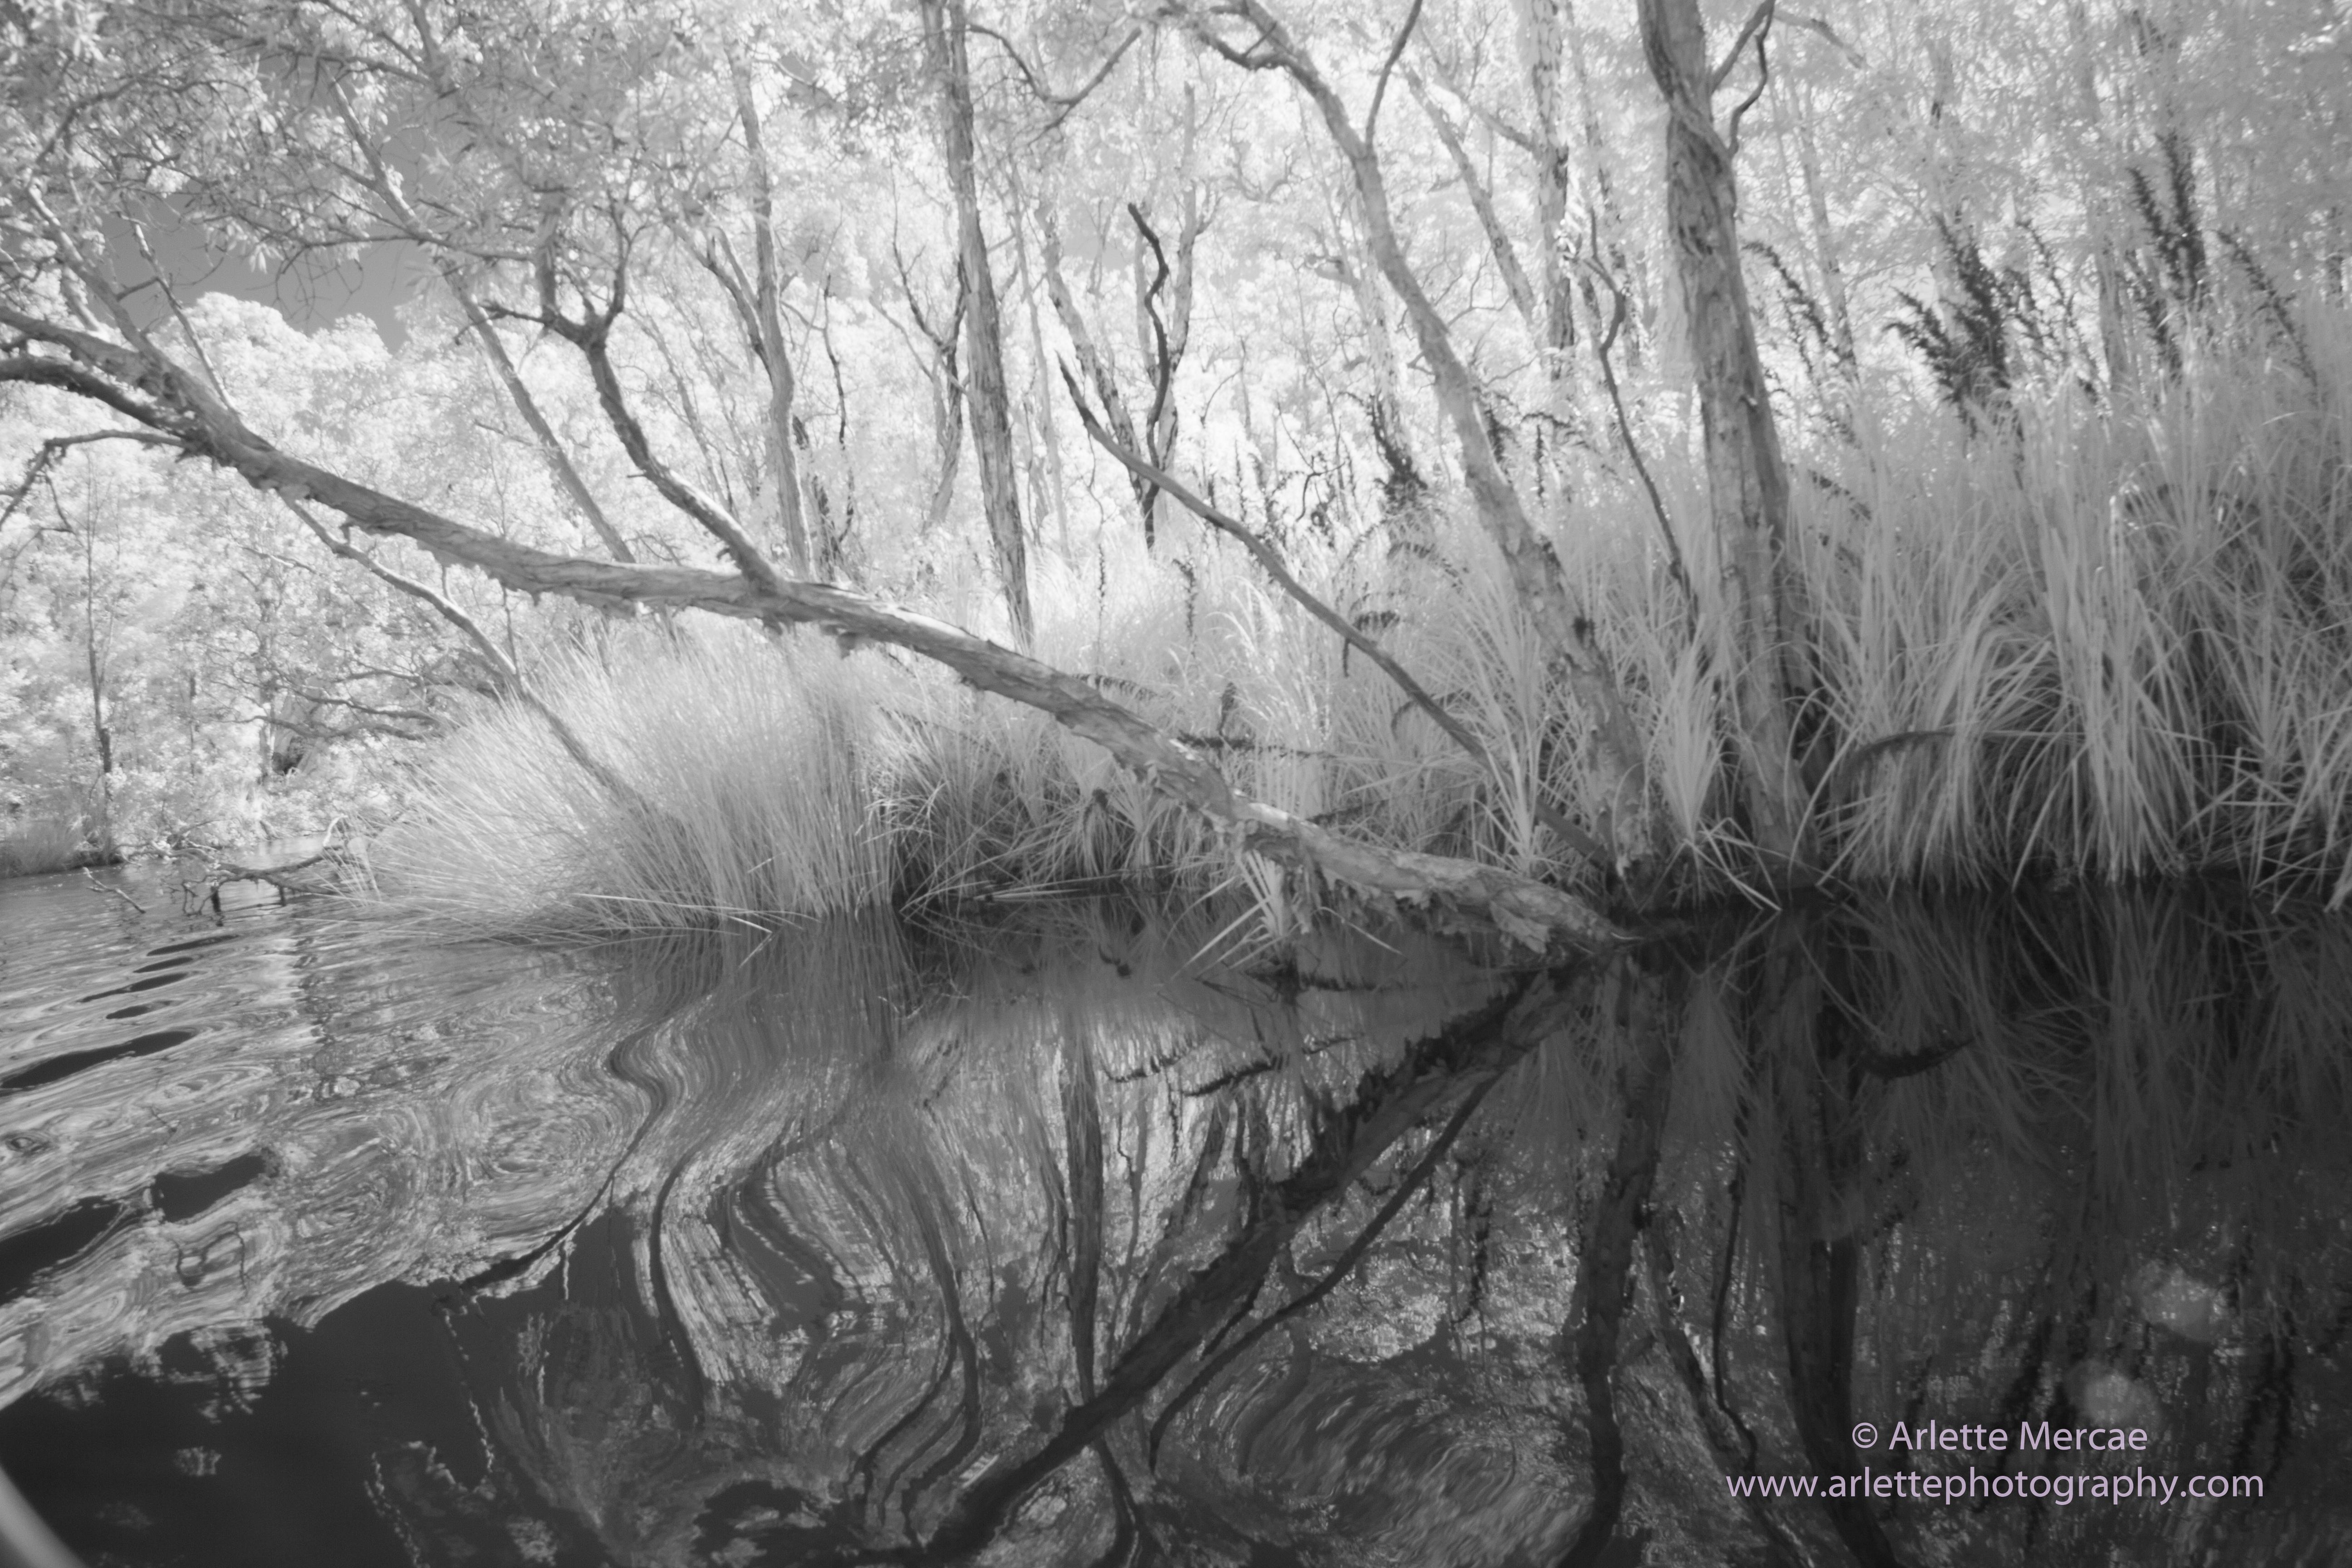 Noosa Everglades - 15